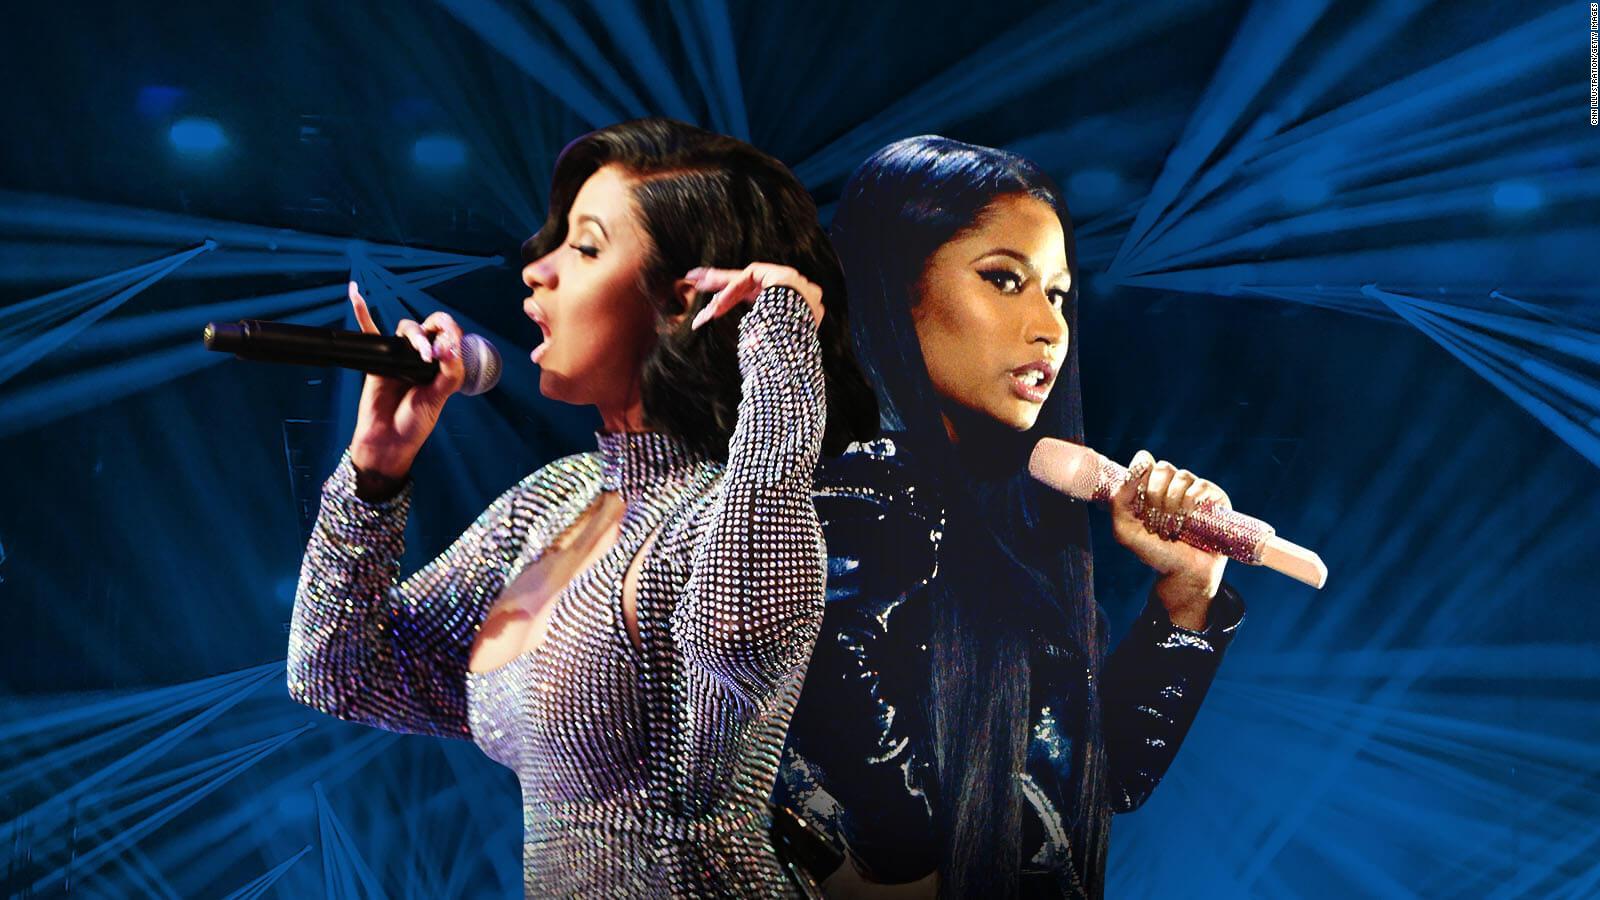 Nicki Minaj launches merchandise line based on Cardi B fight   CNN 1600x900